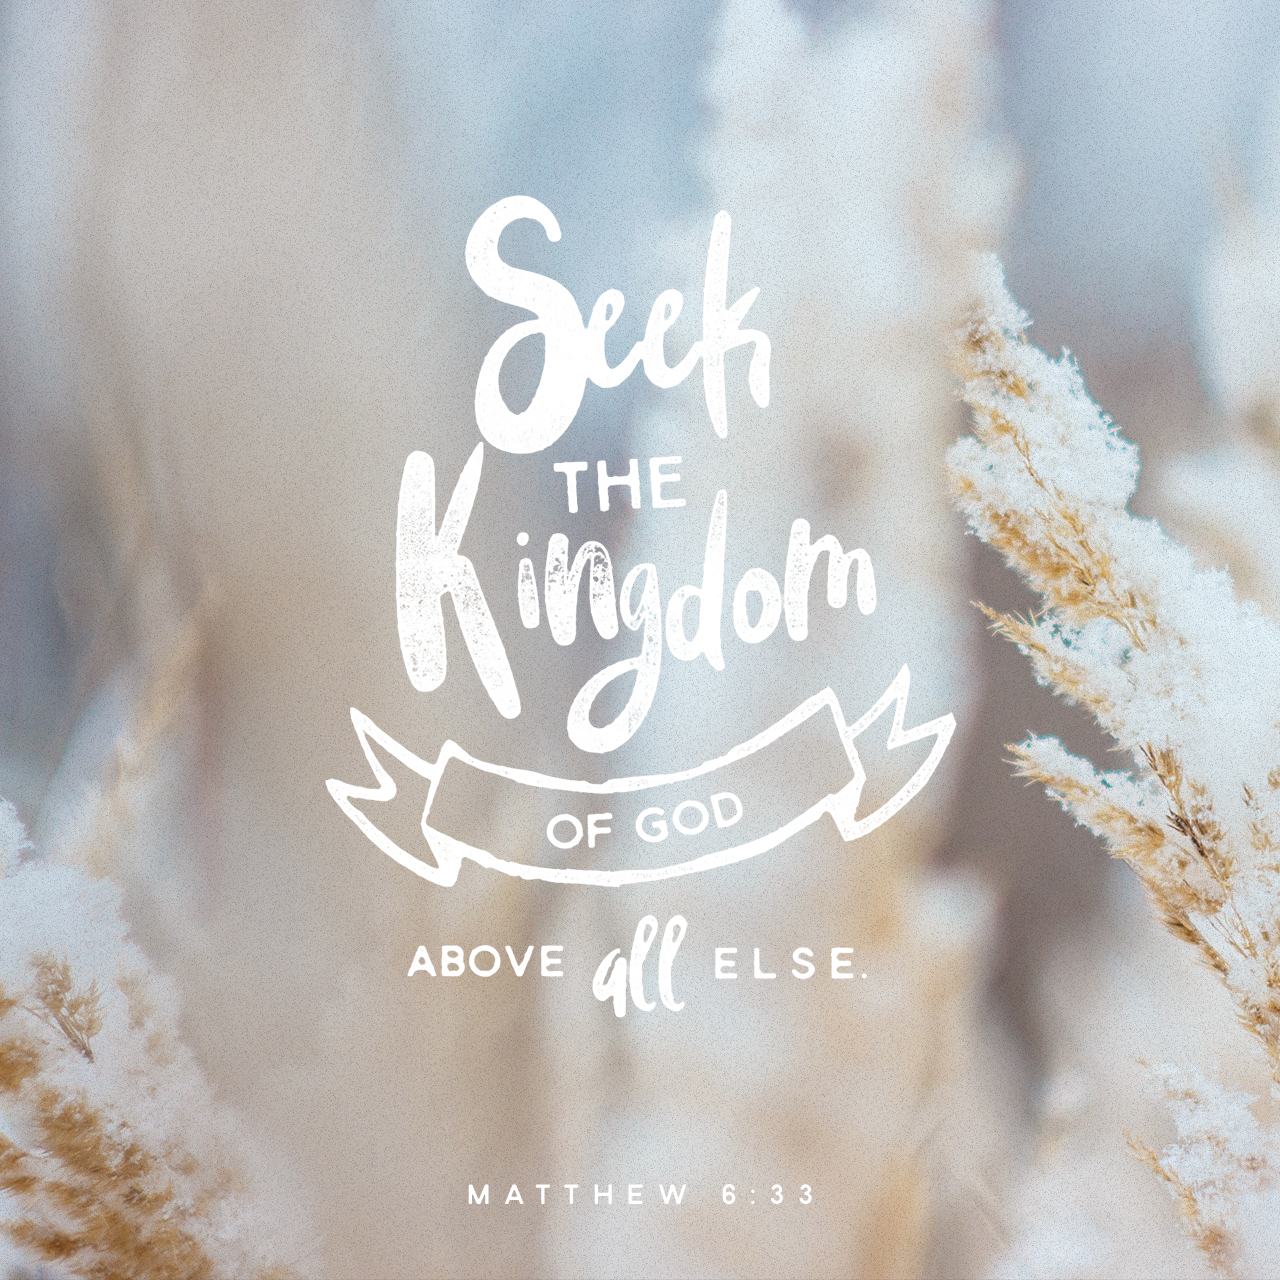 Matthew 6:33 (JPG)